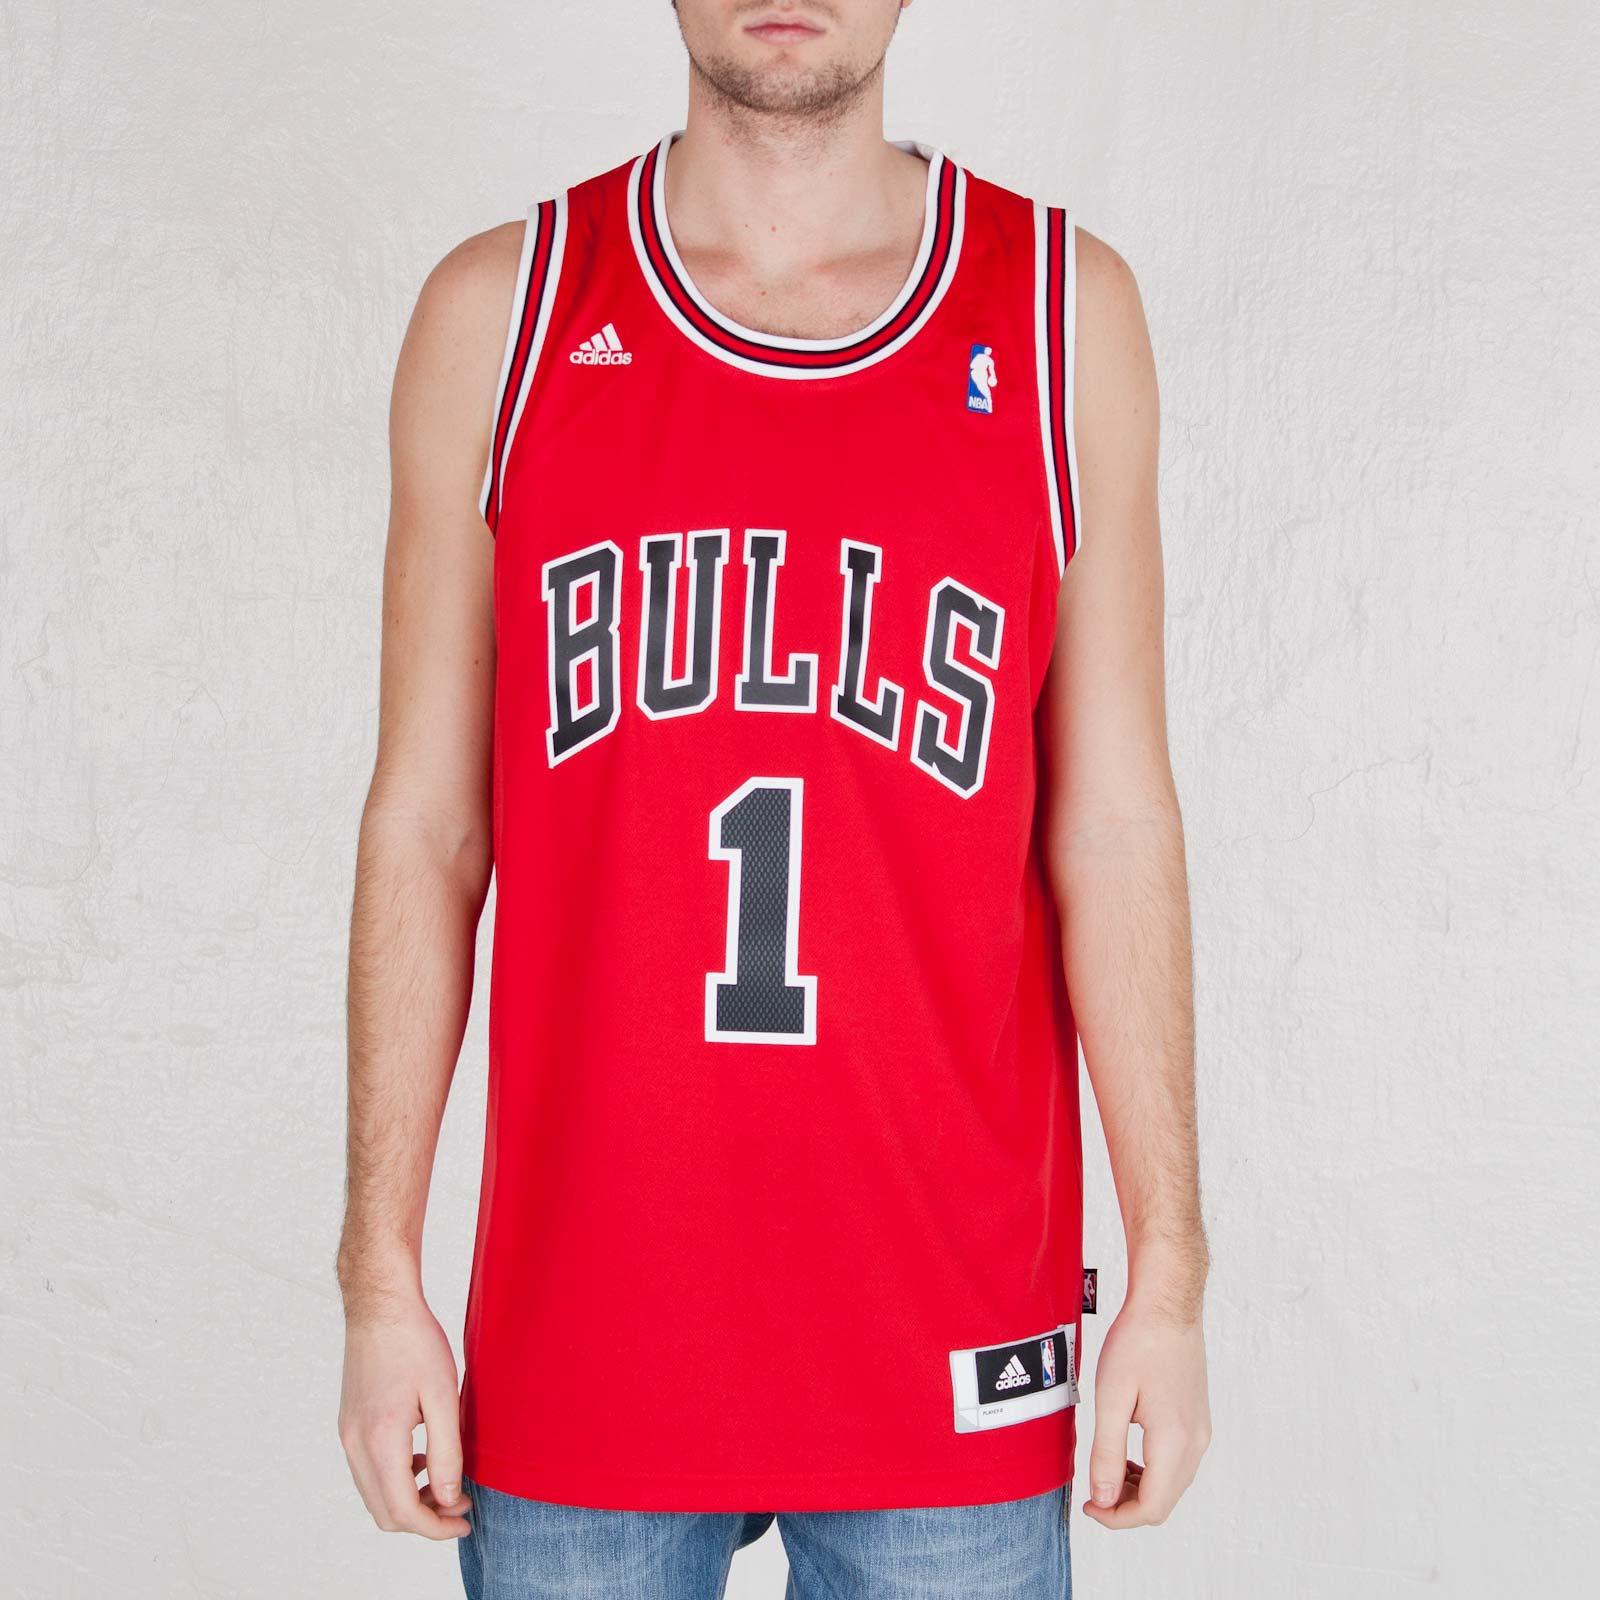 a8ad4e64792 adidas NBA Chicago Bulls Jersey - L68565 - Sneakersnstuff